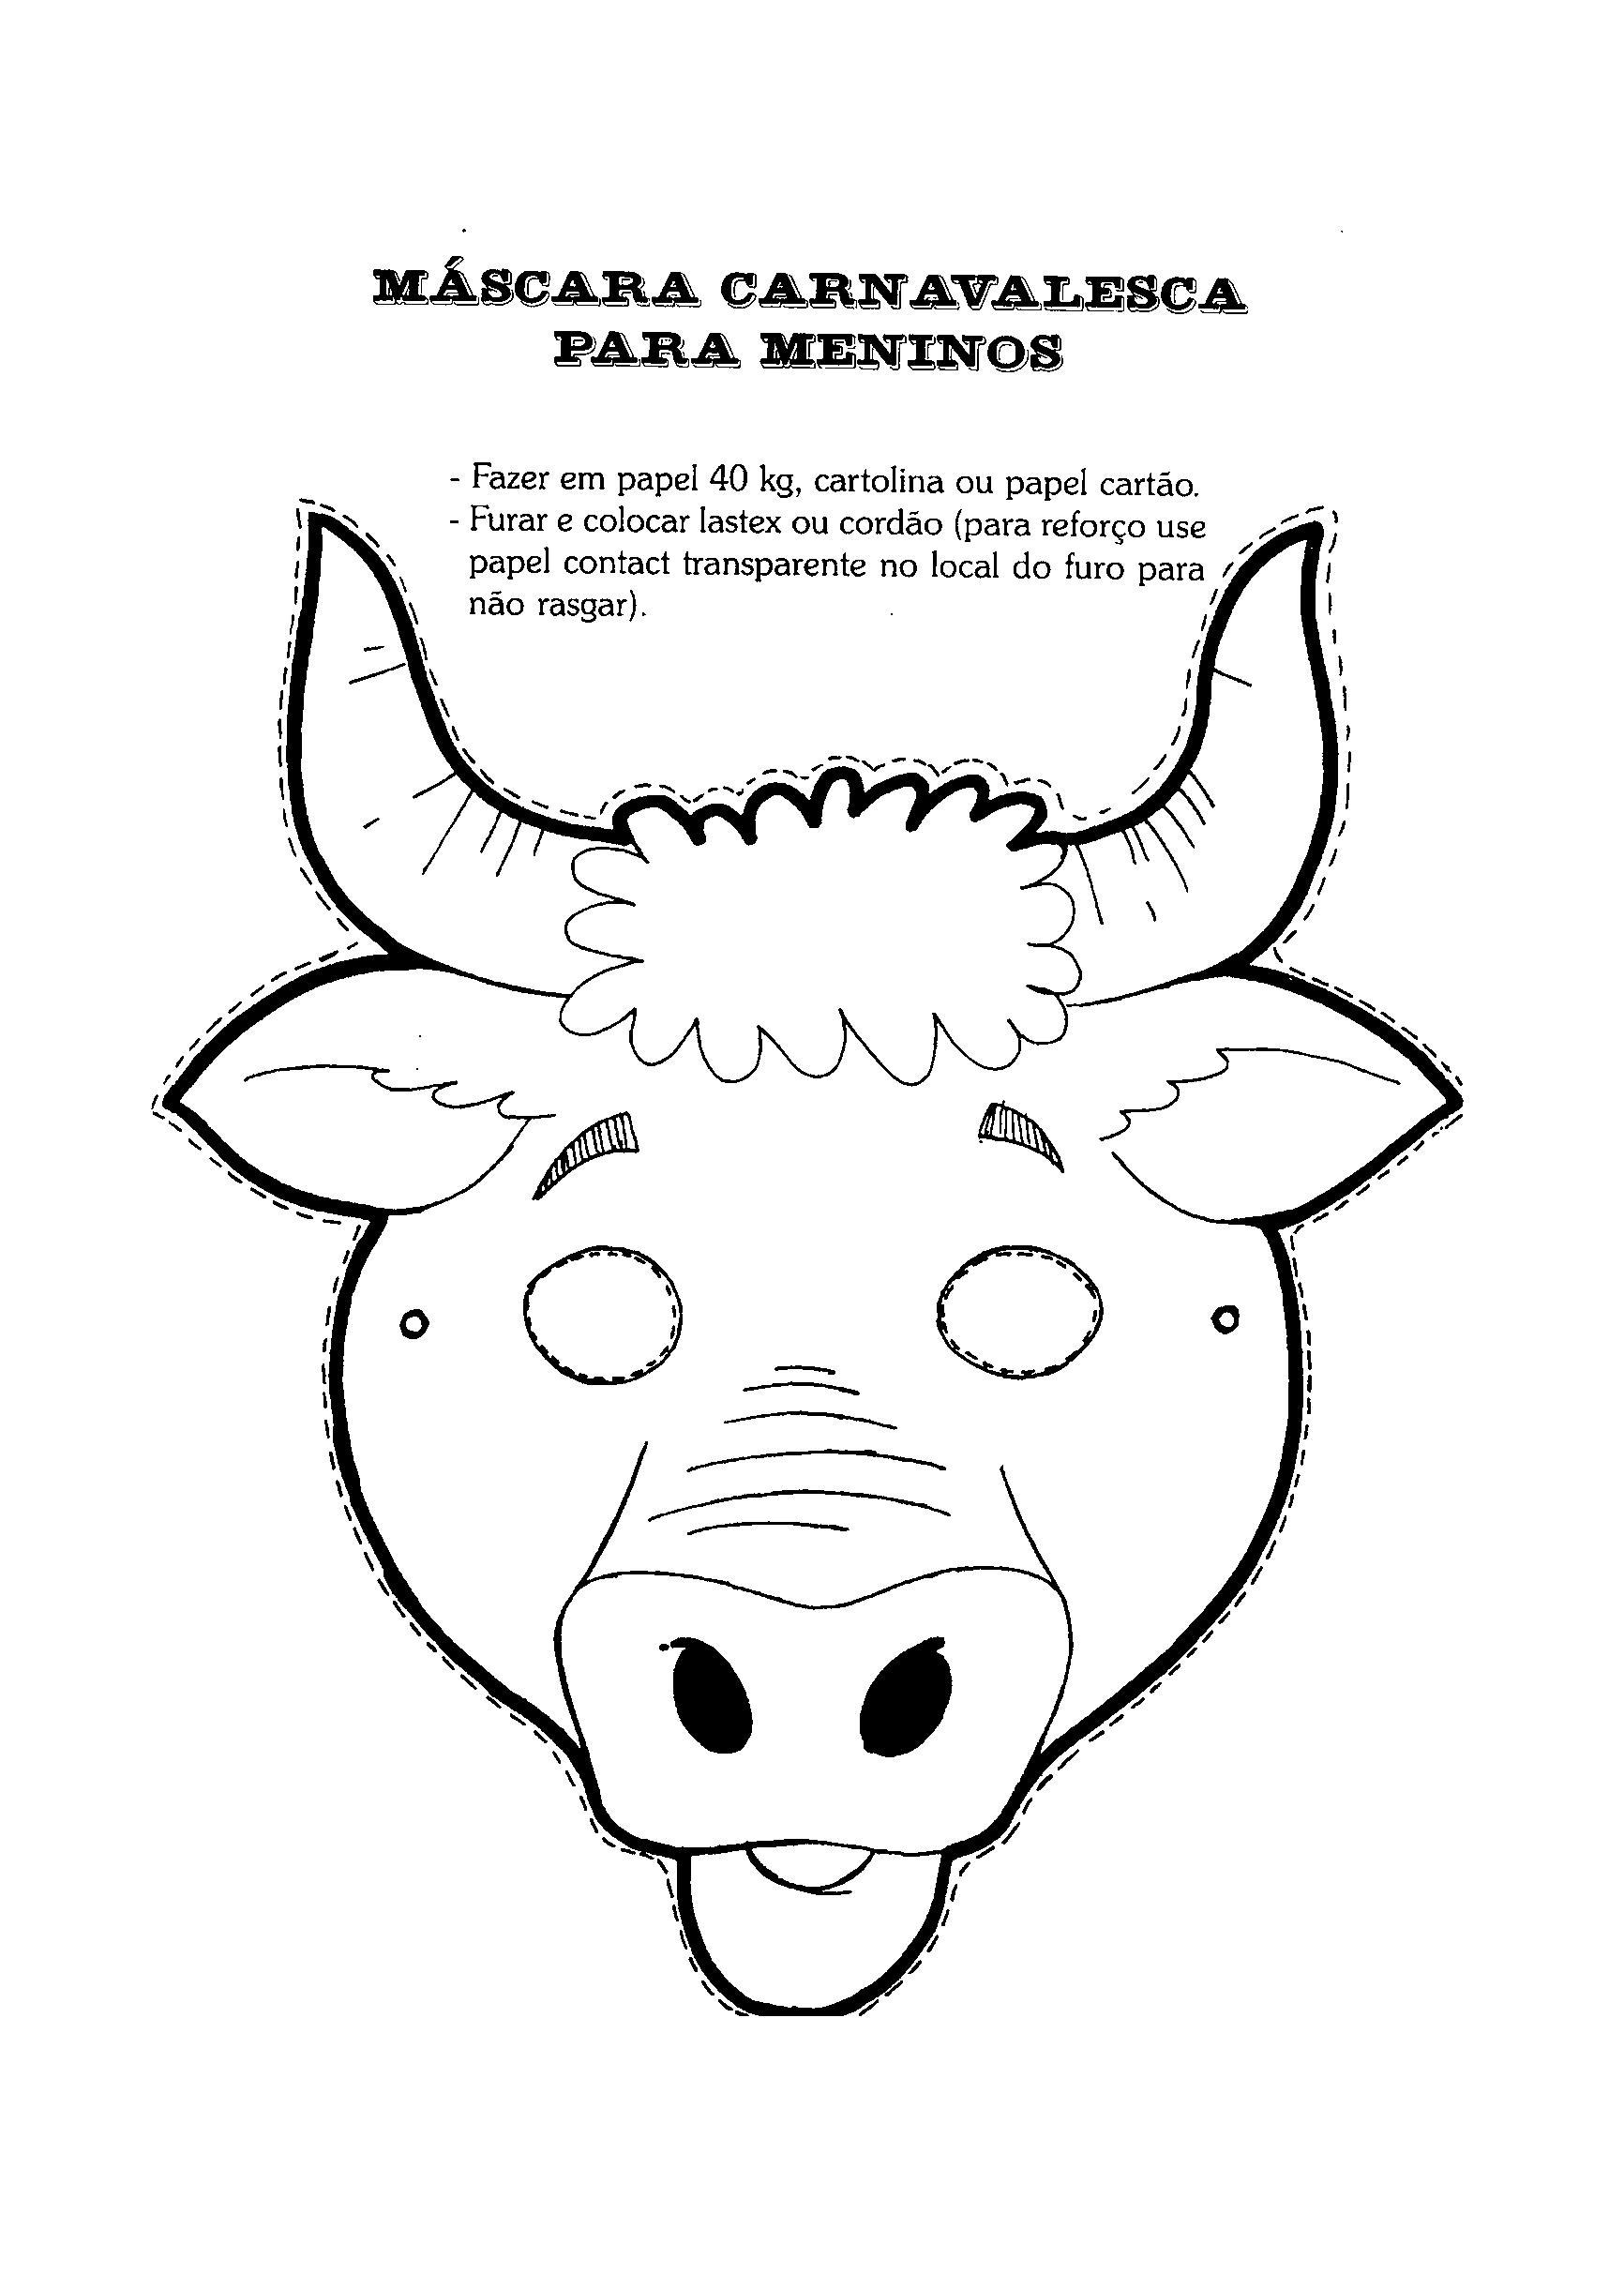 0274-mascara-carnaval-touro